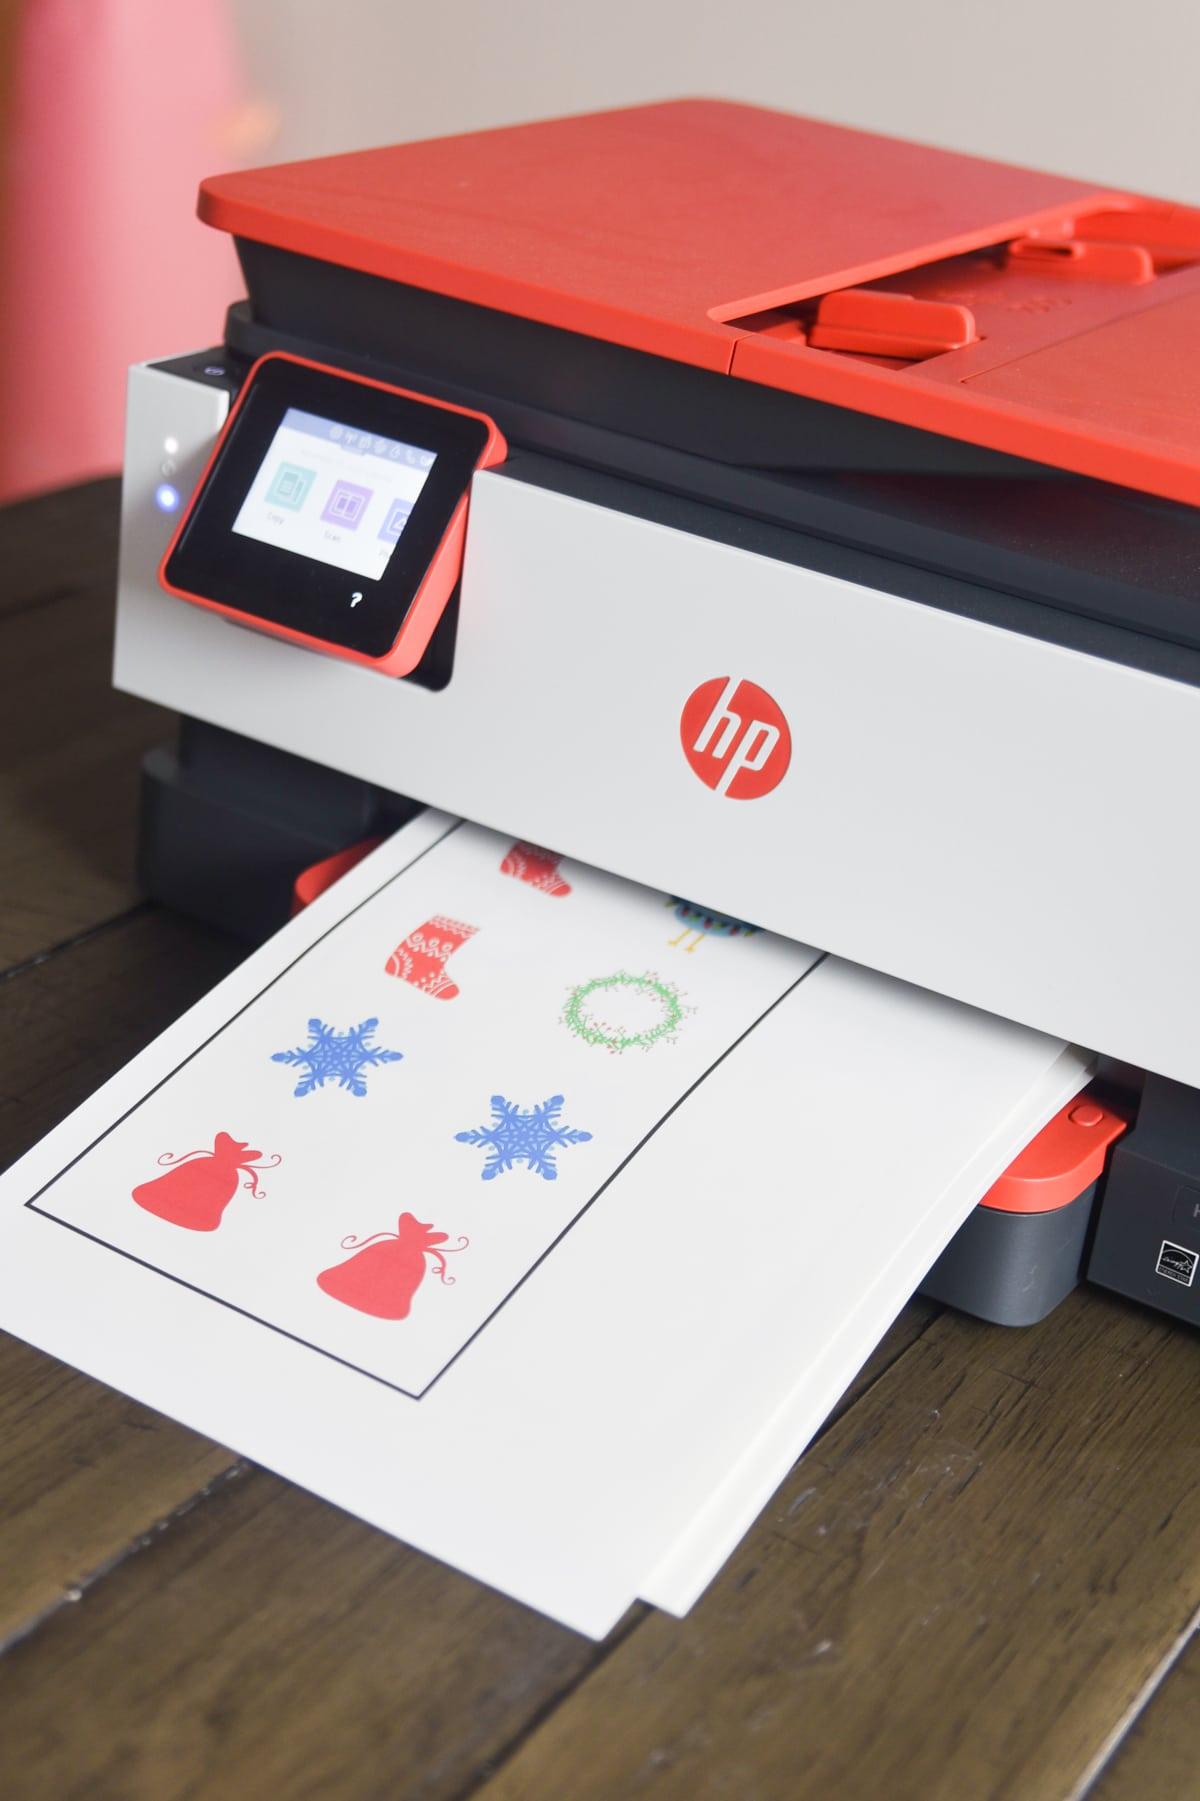 hp printer for cricut print and cut